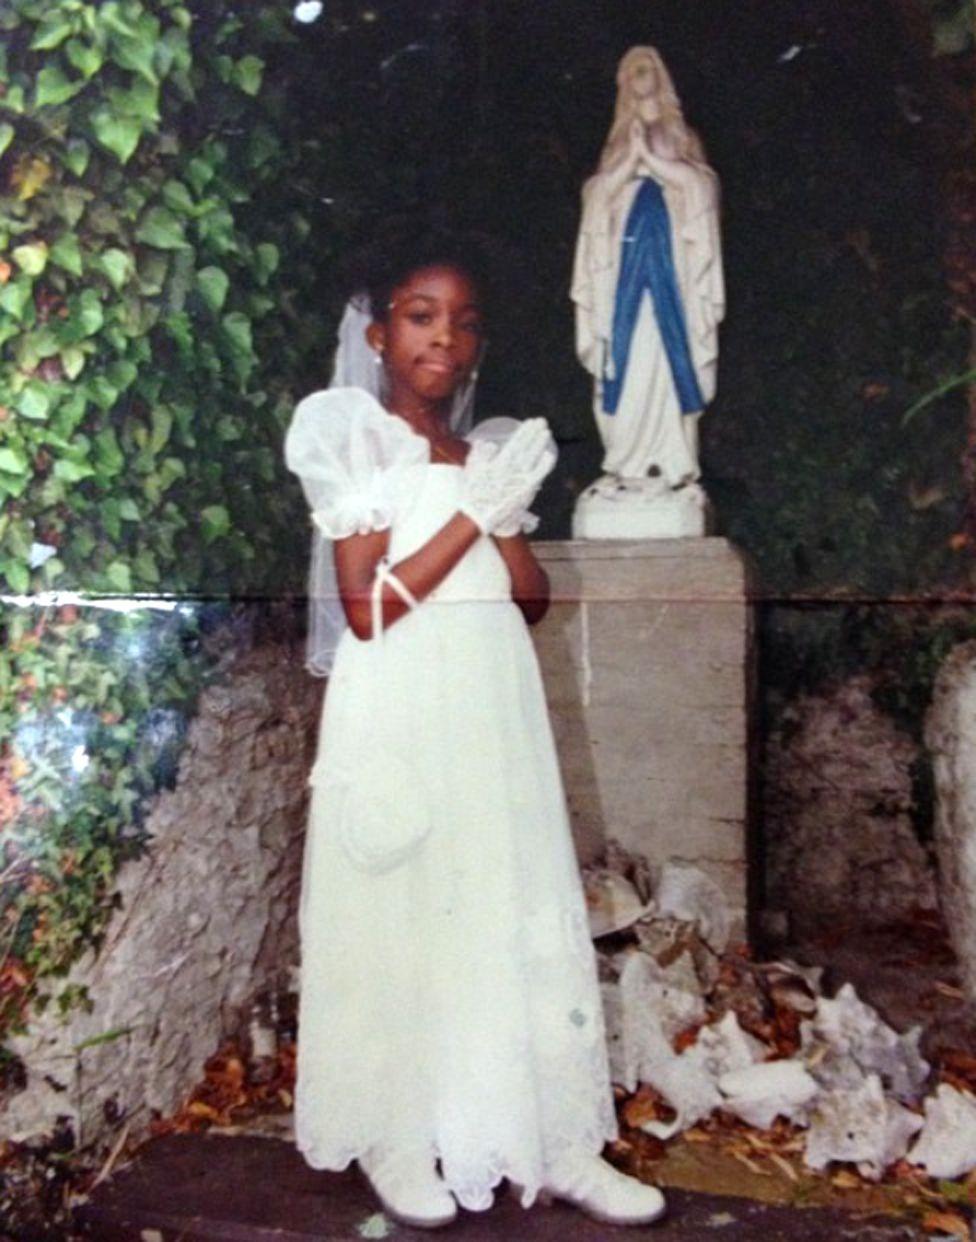 Nequela Whittaker at her first communion